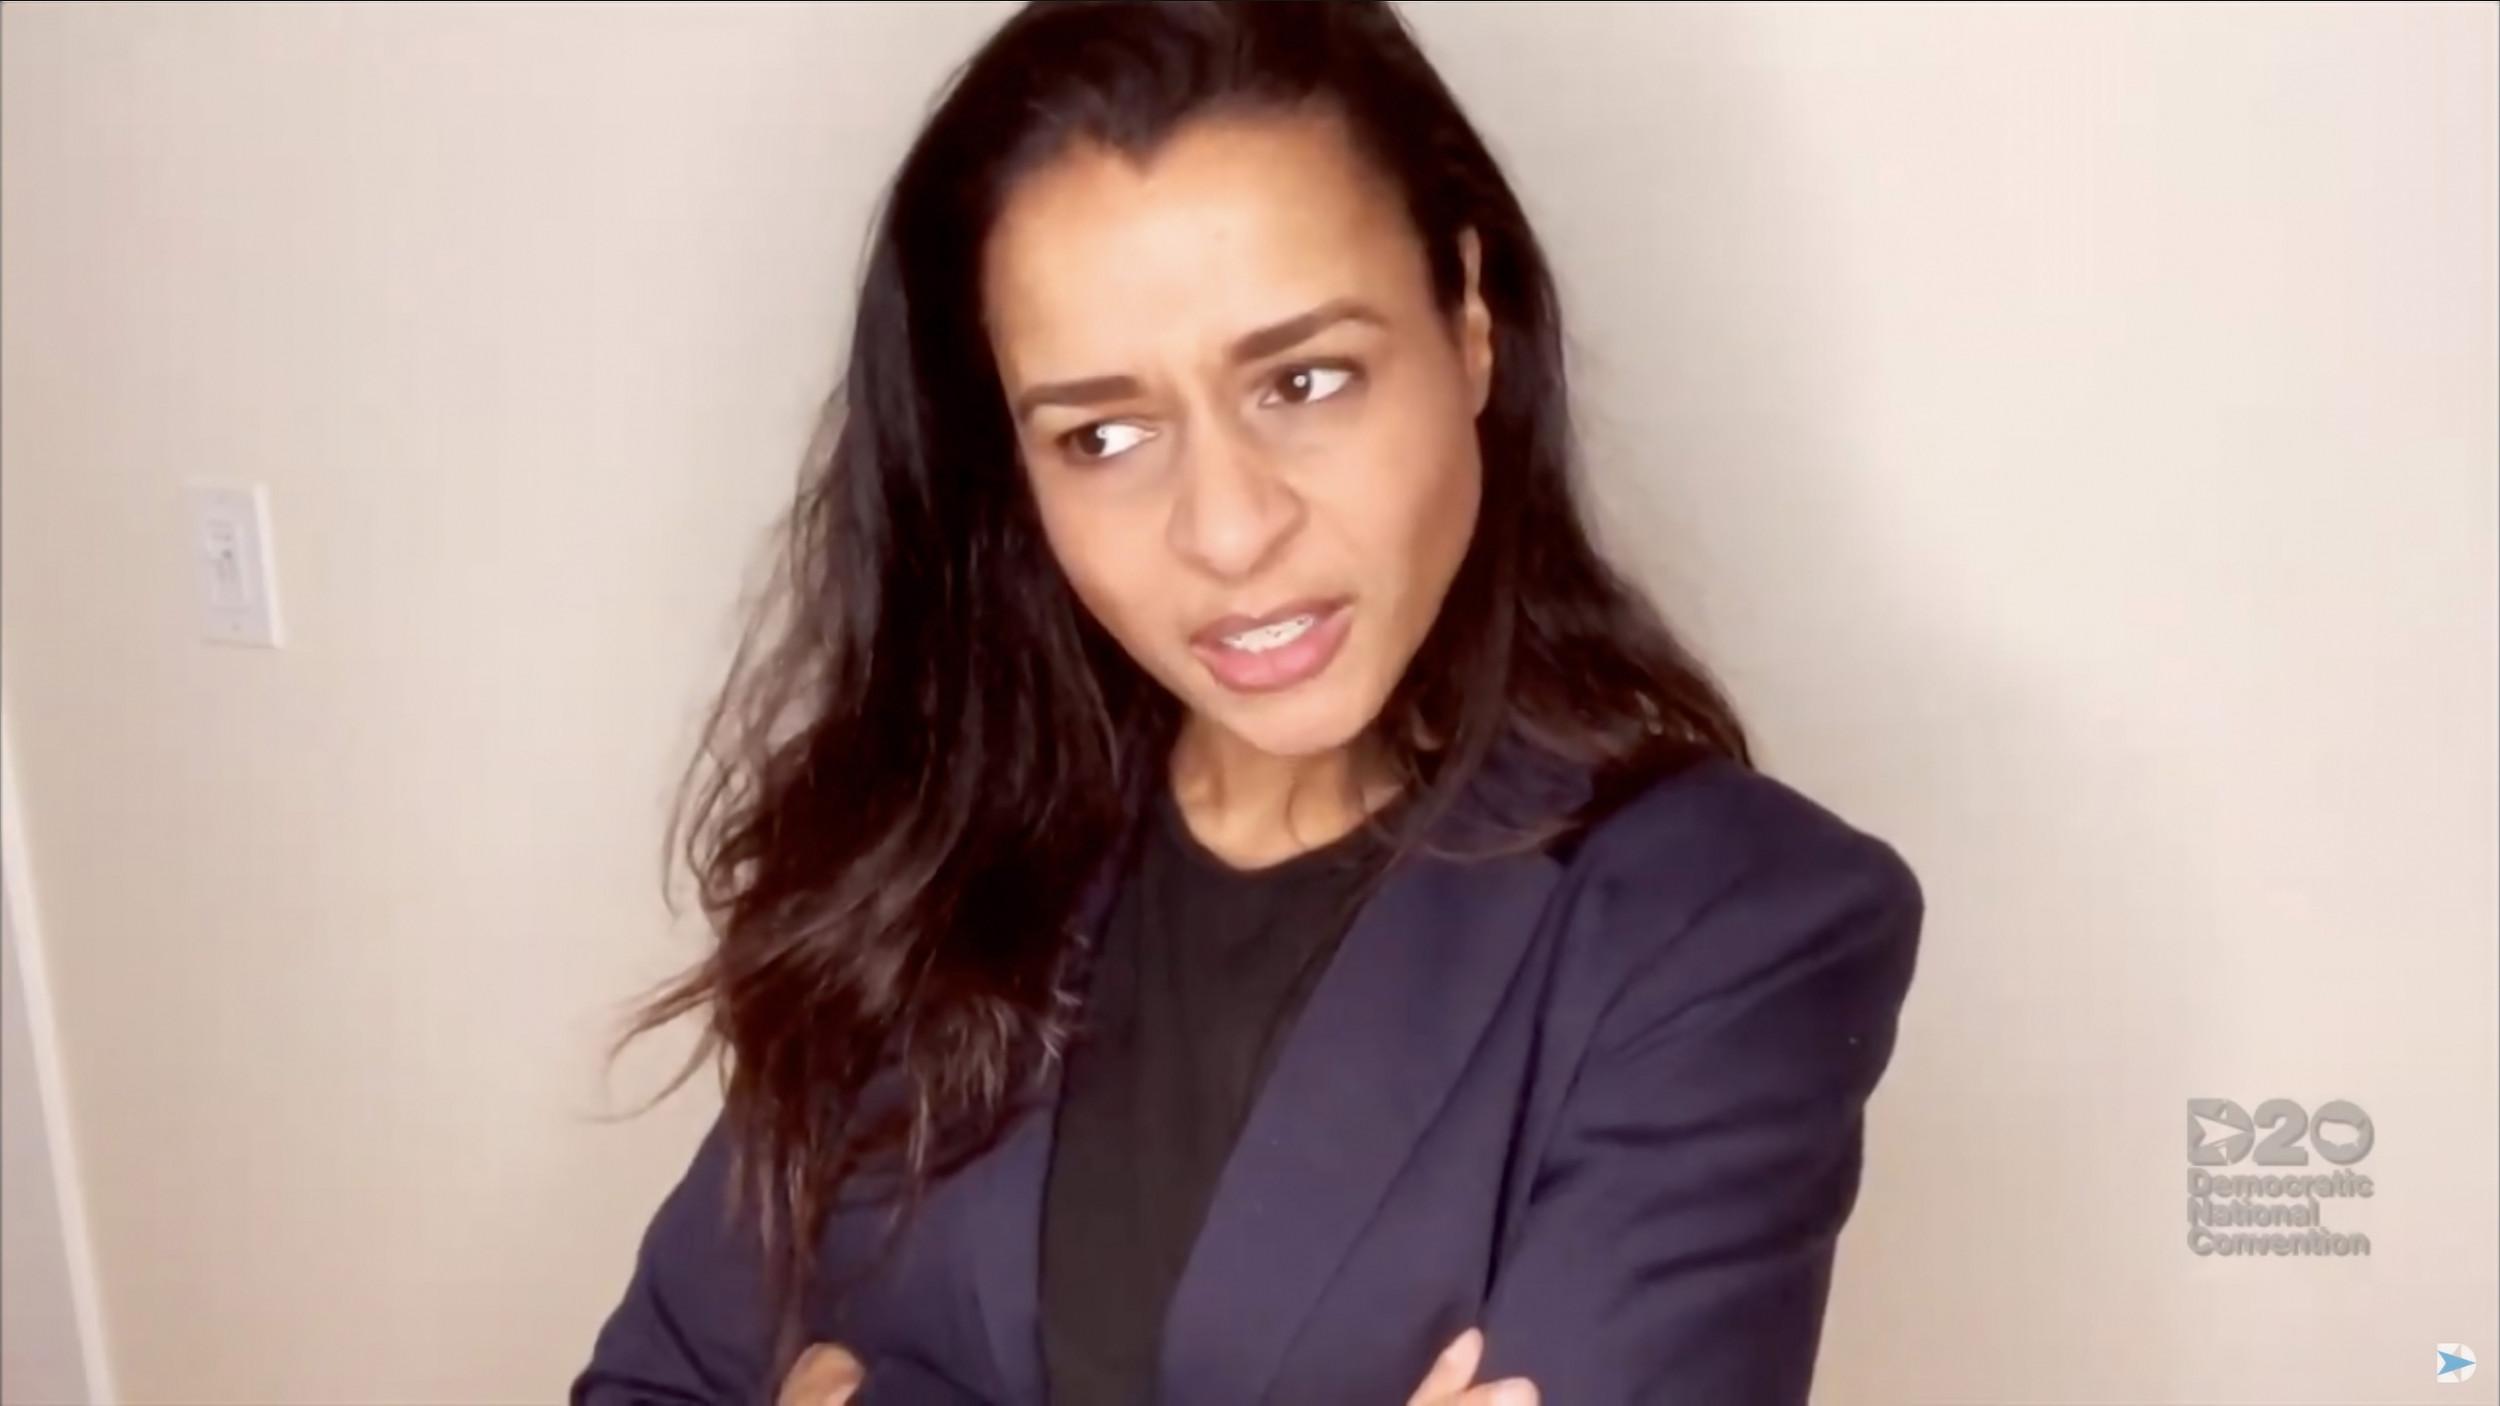 Sarah Cooper's spot-on Don Jr. impression dominates TikTok